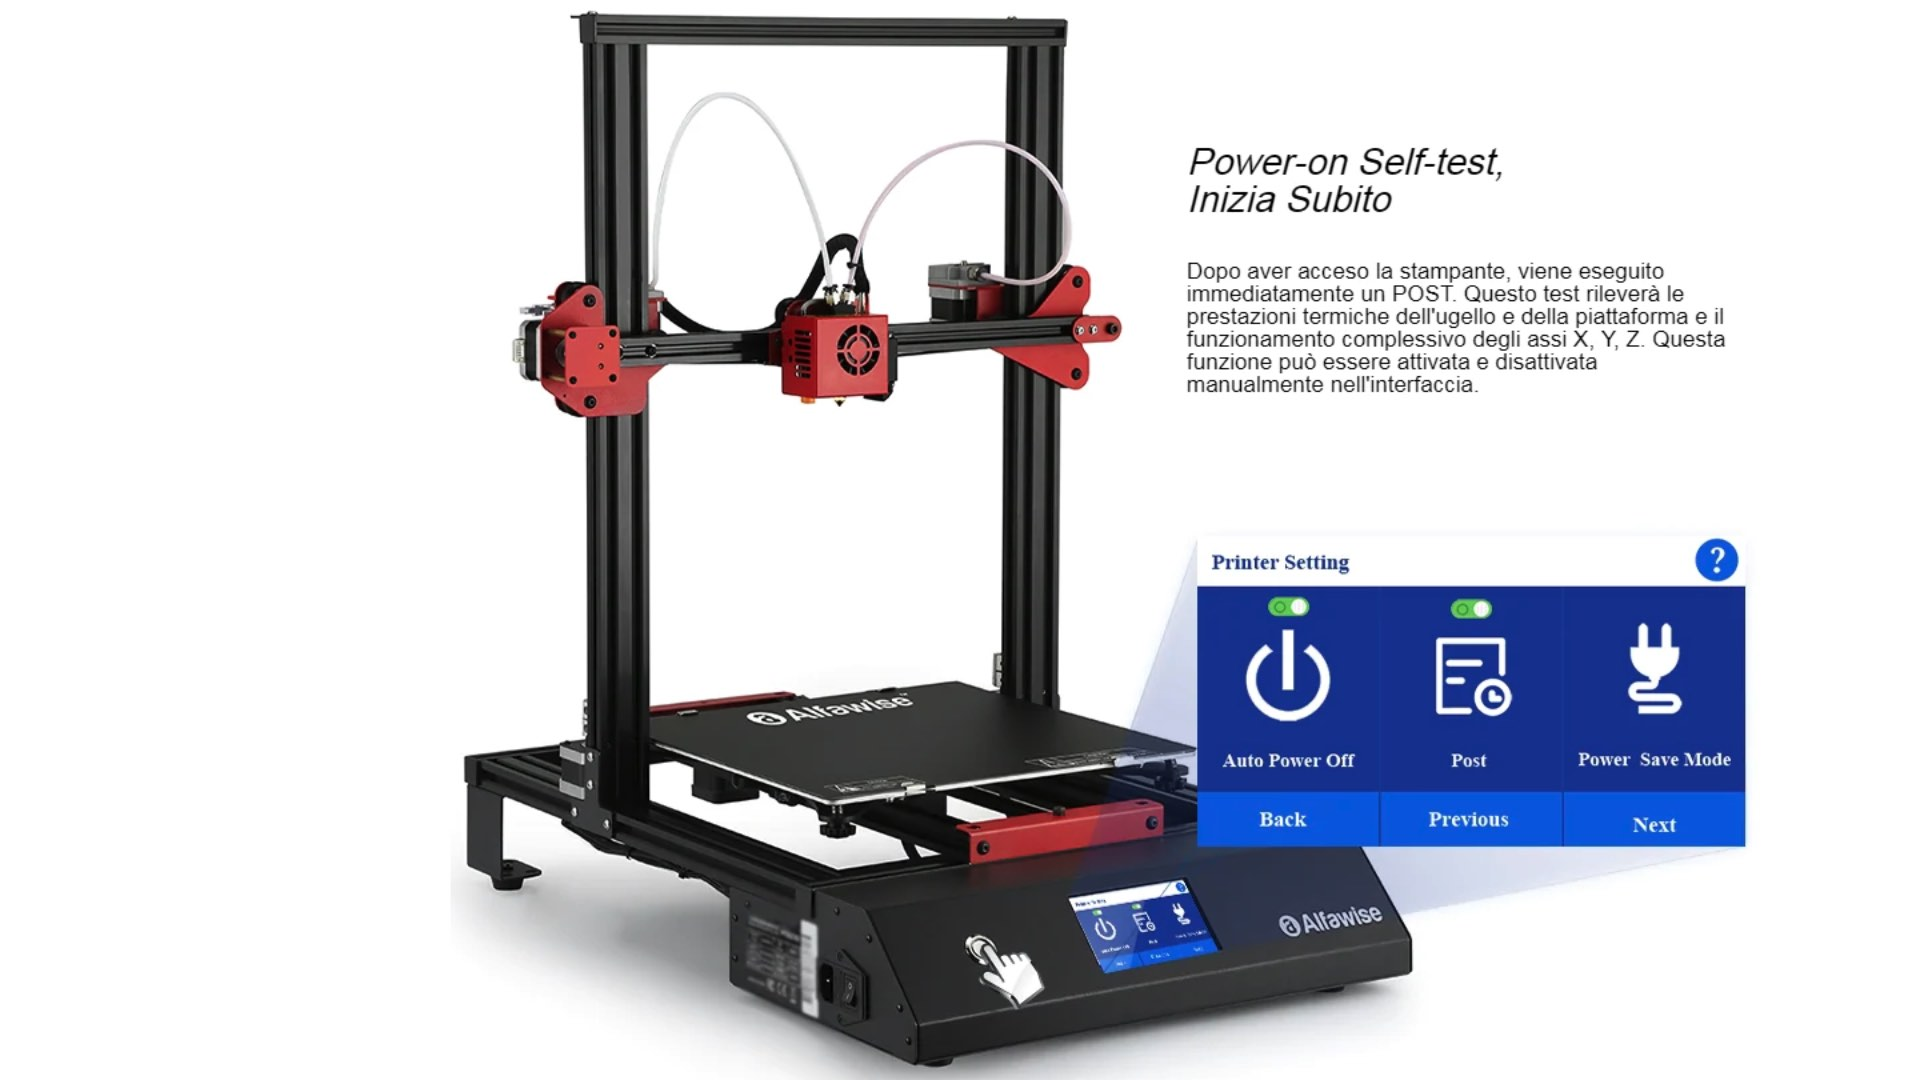 Alfawise U20 Mix stampante 3D smart – GearBest